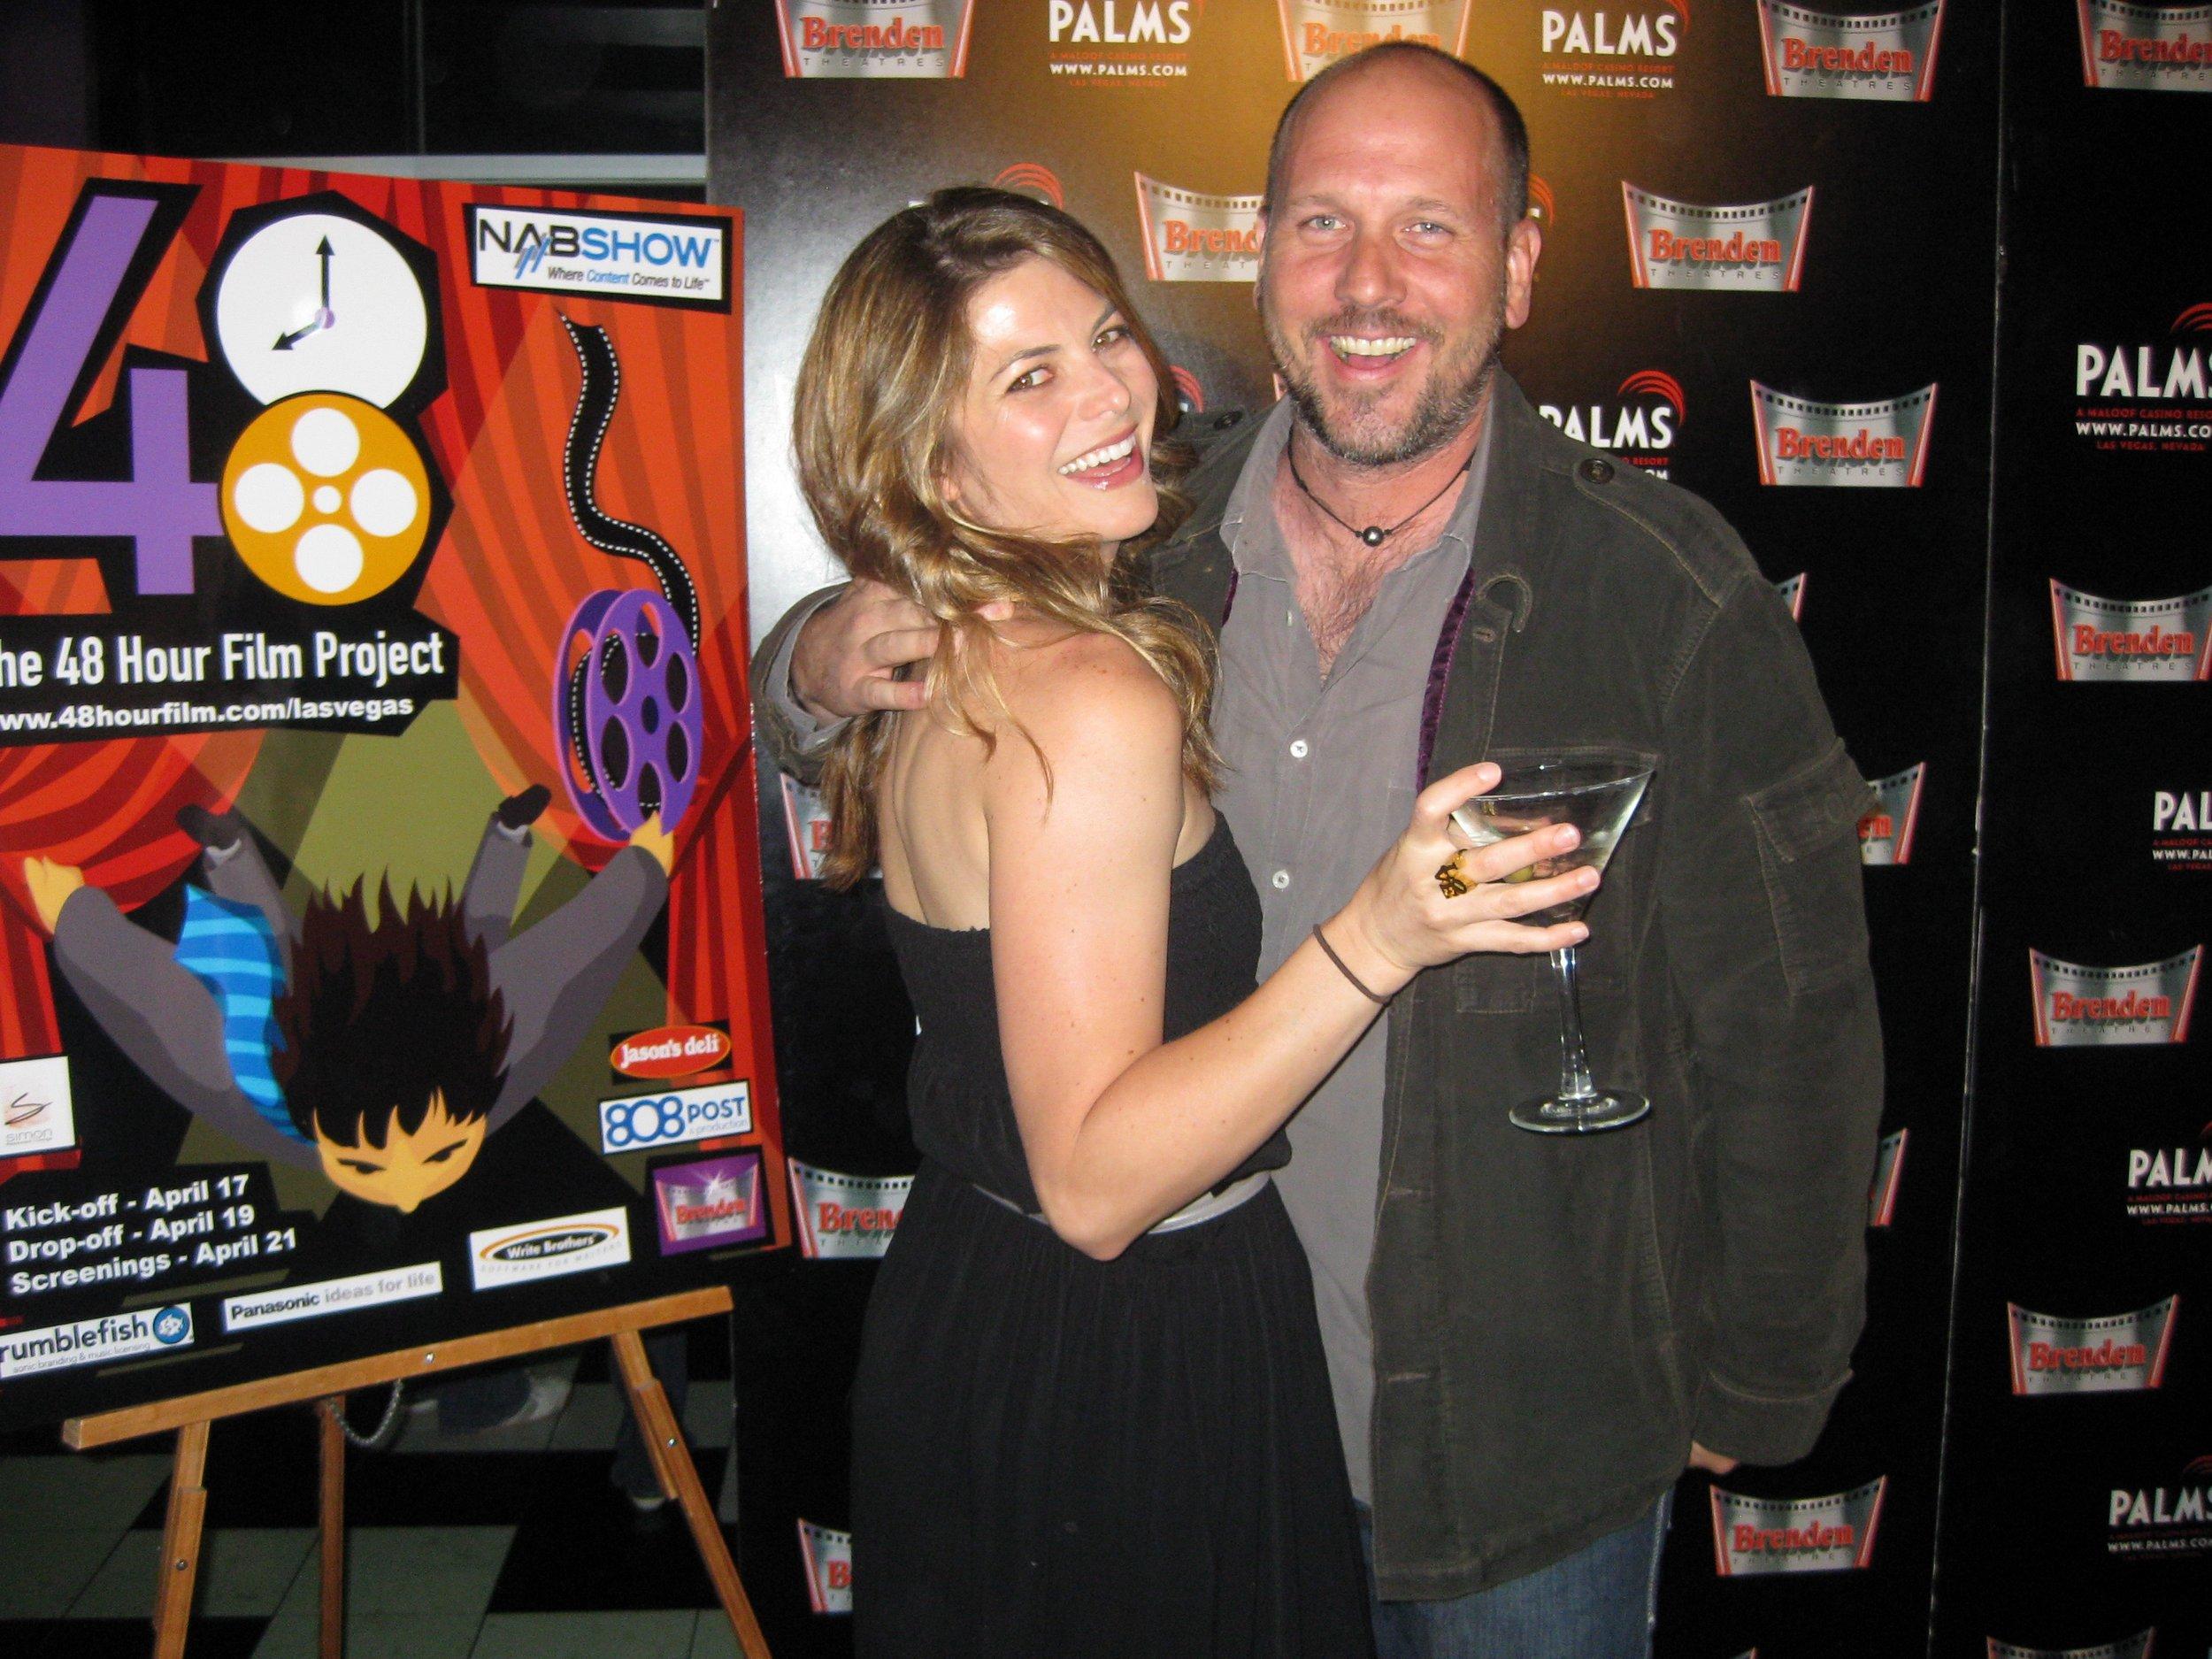 Julia Rose & Sean Doyle - Red Carpet @ The Palms